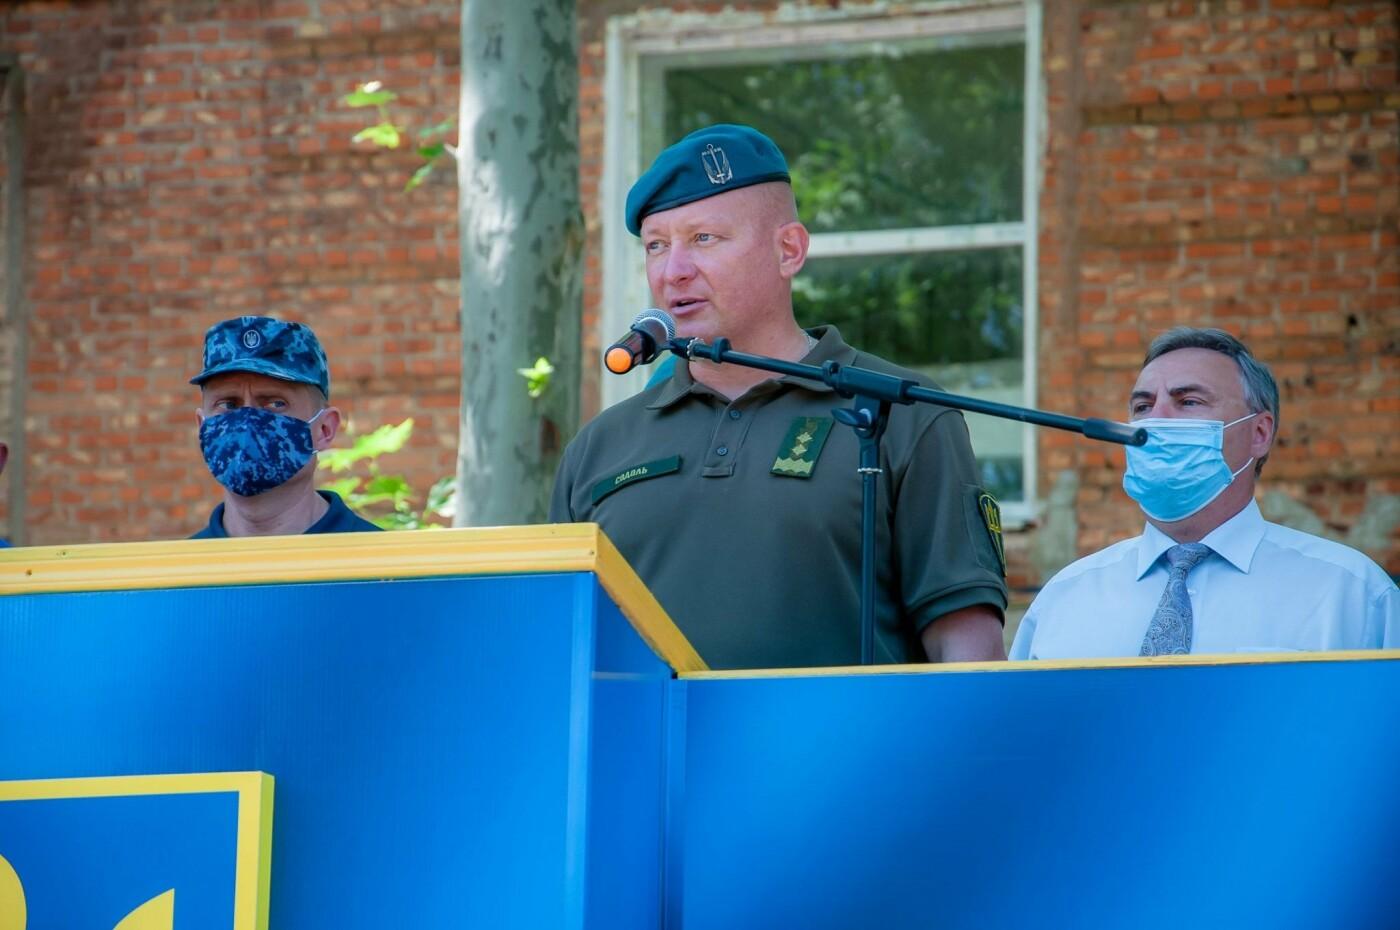 В Николаеве открыли школу морского пехотинца на базе учебного центра ВМФ, фото-1